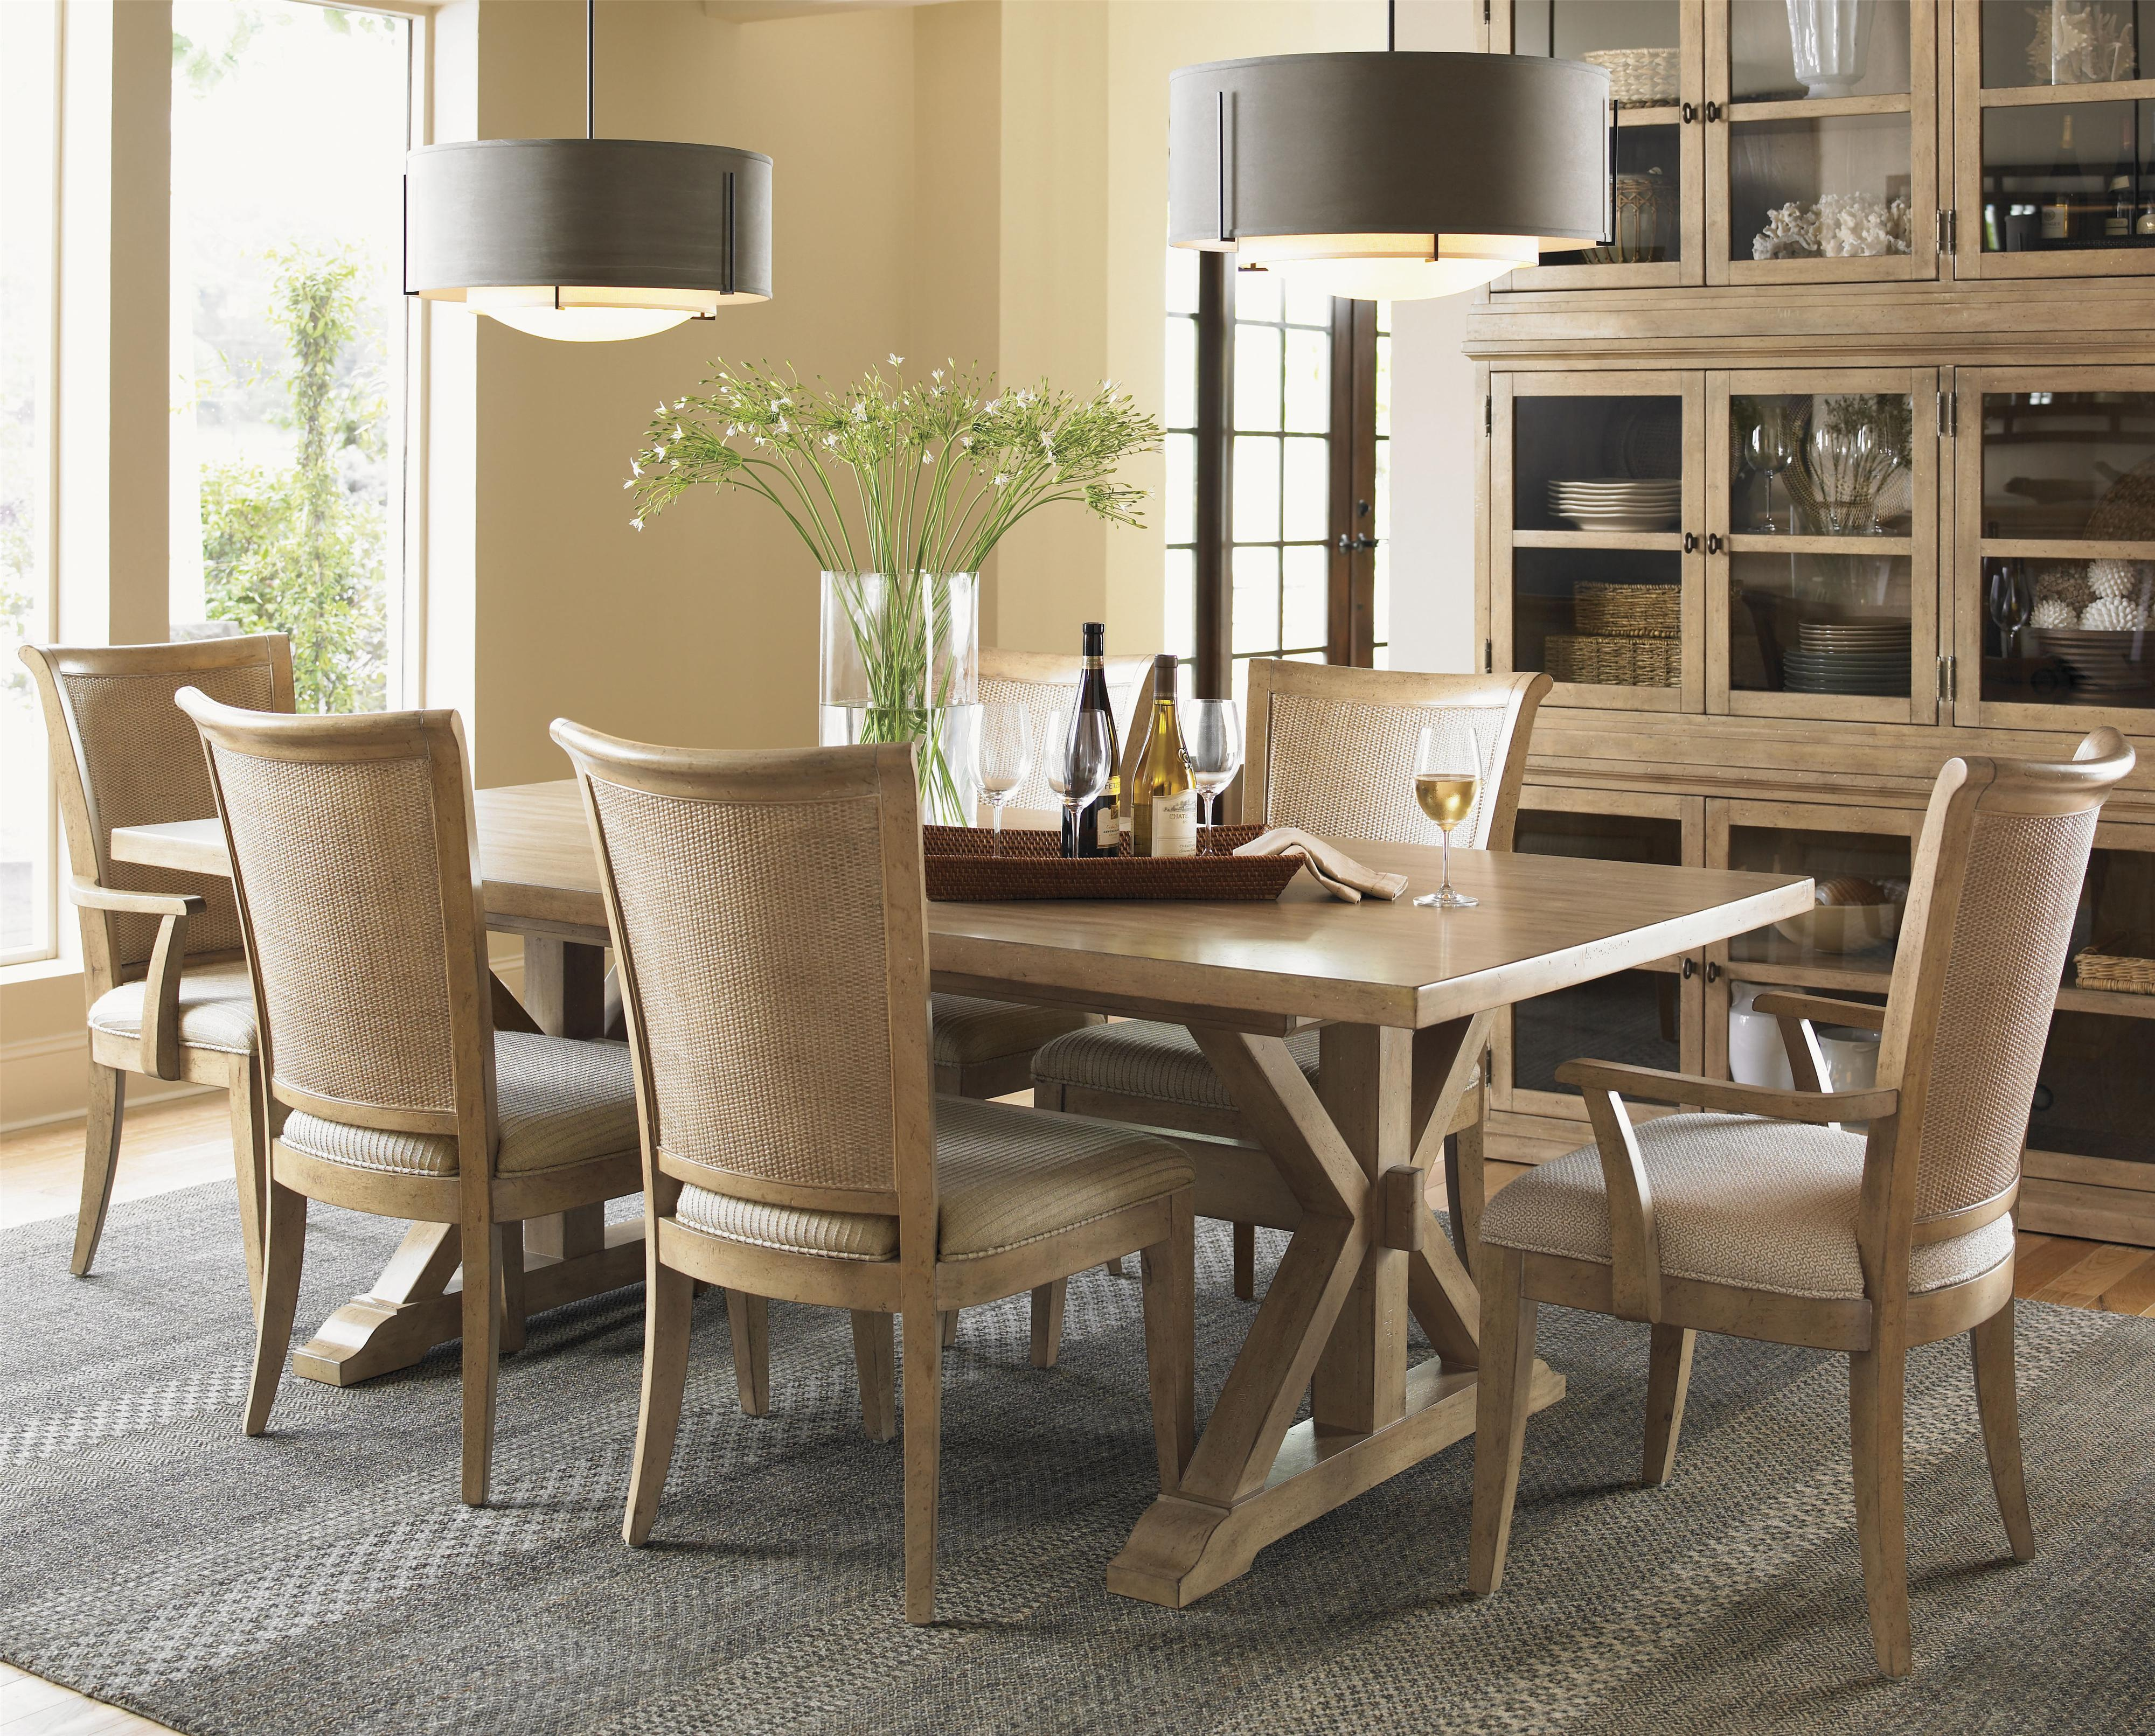 Lexington monterey sands seven piece walnut creek dining table and los altos chairs set baer 39 s Lexington home brands outdoor furniture